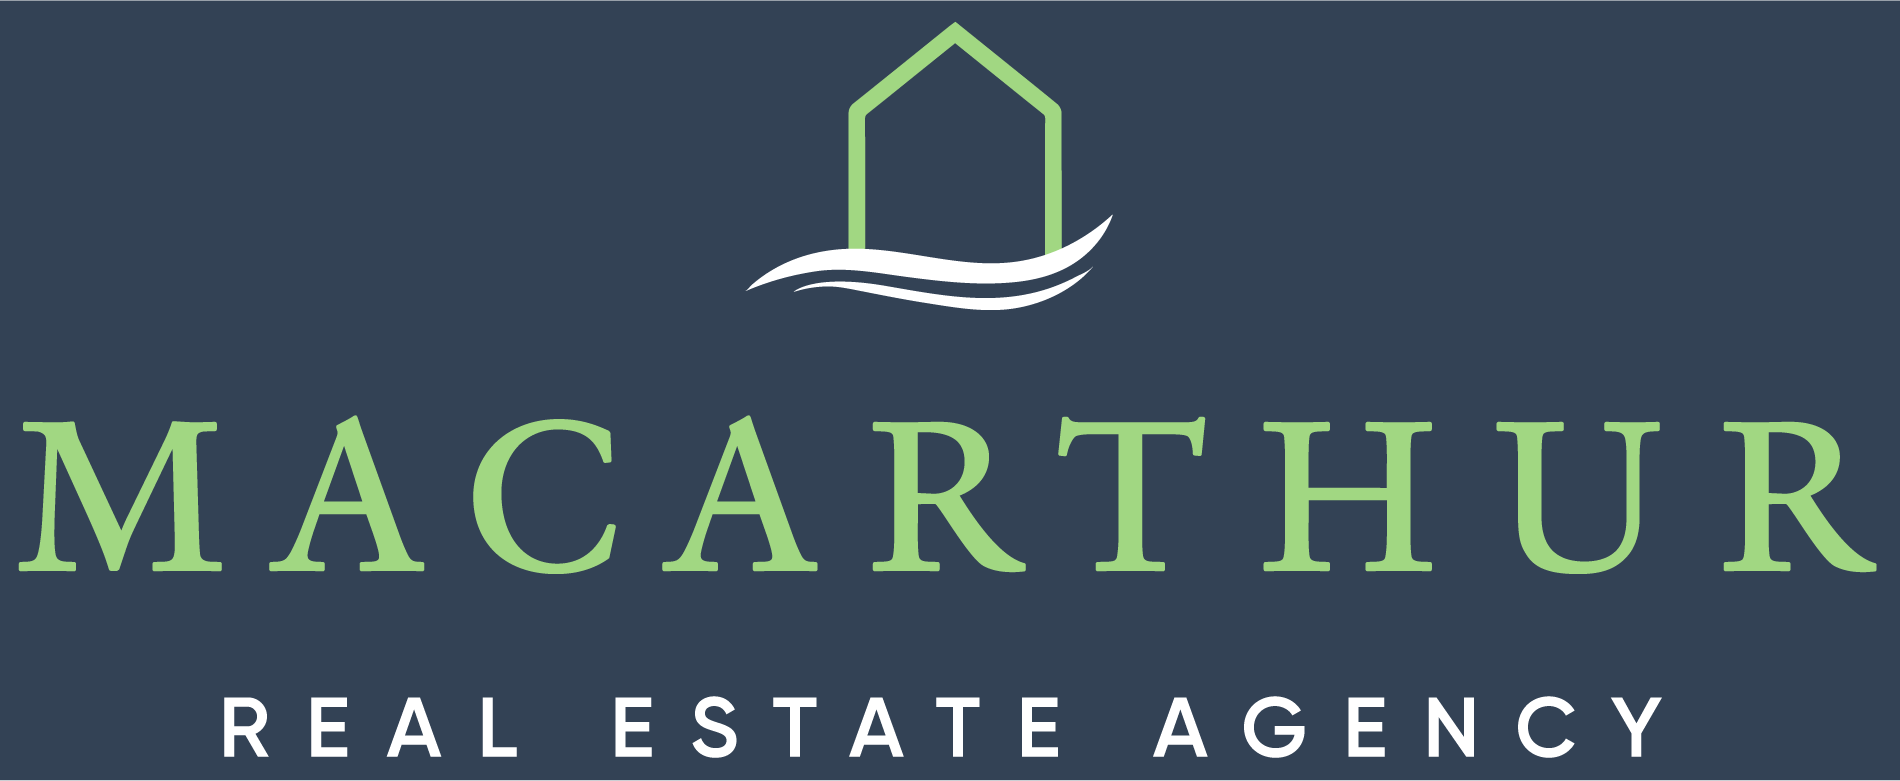 Macarthur Real Estate Agency Pty Ltd